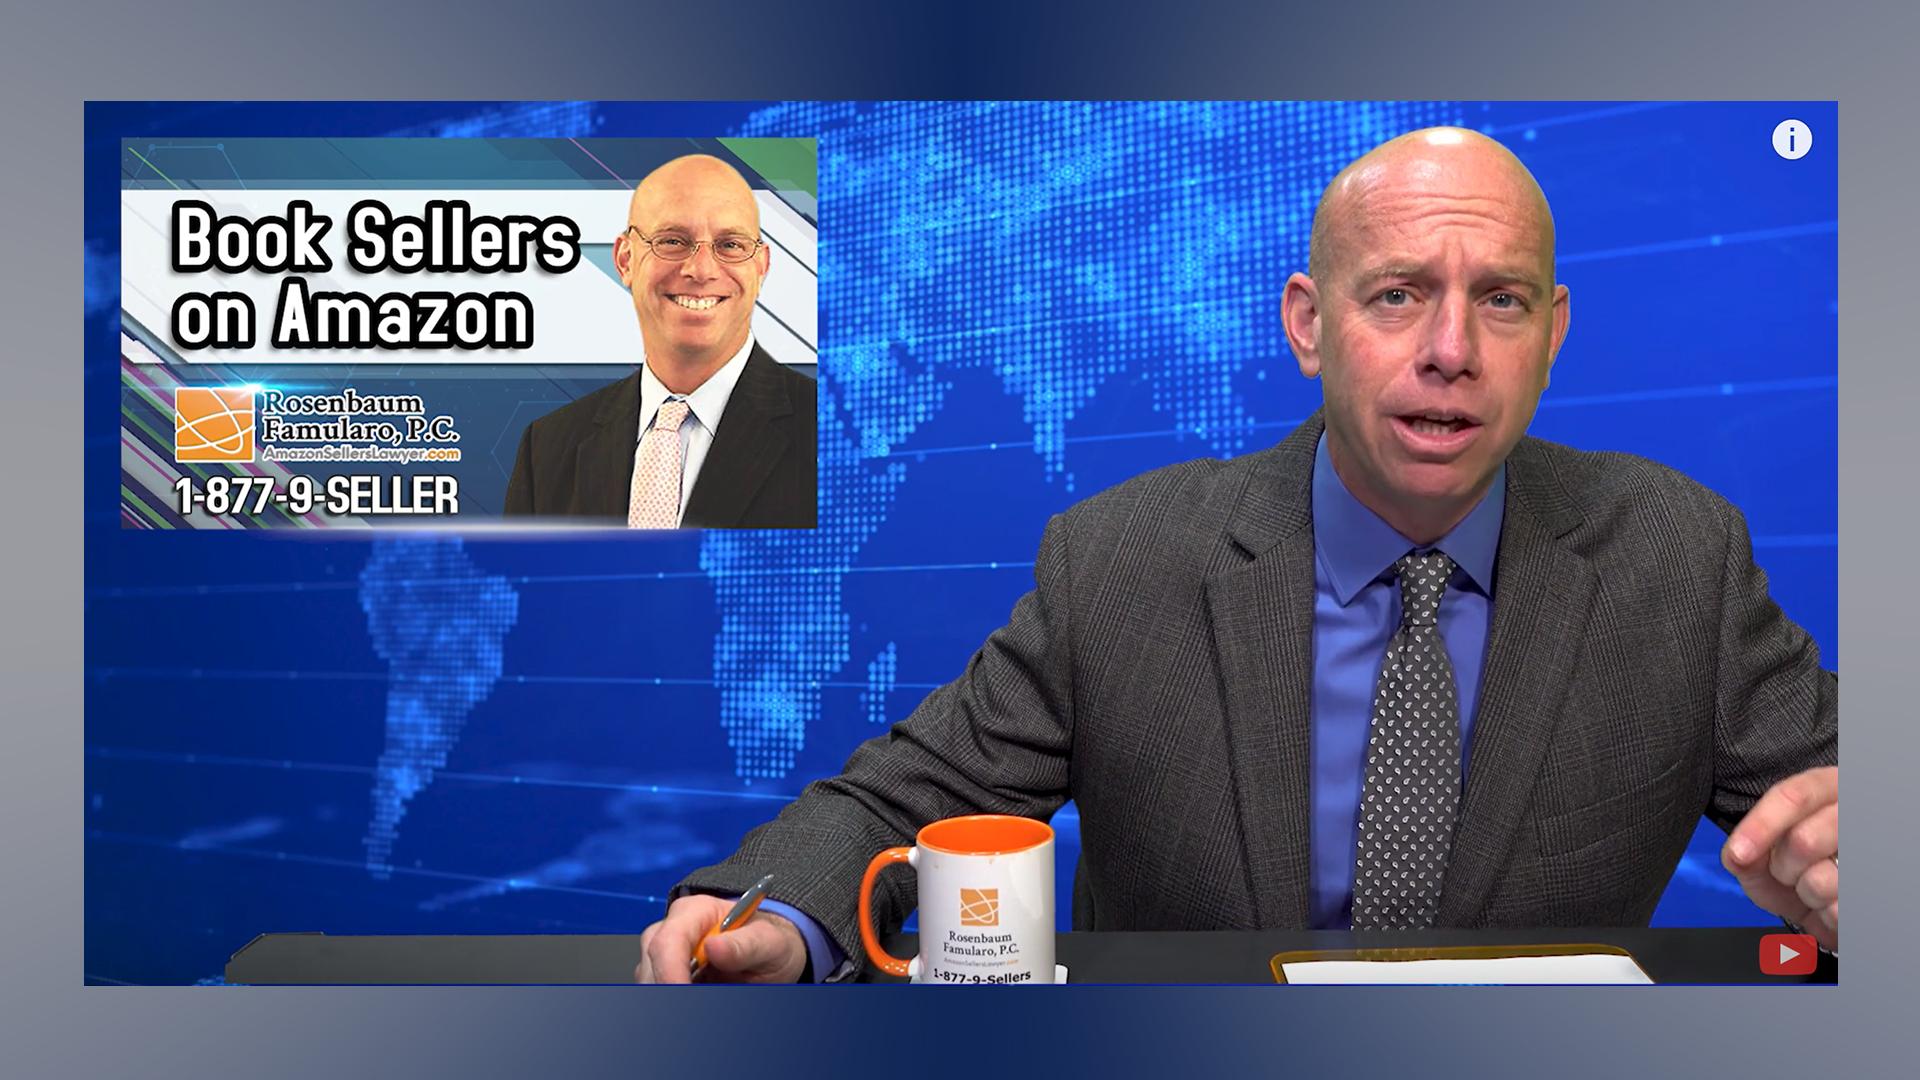 Amazon Seller IP Complaints, Related Accounts, Grey Market vs Counterfeit